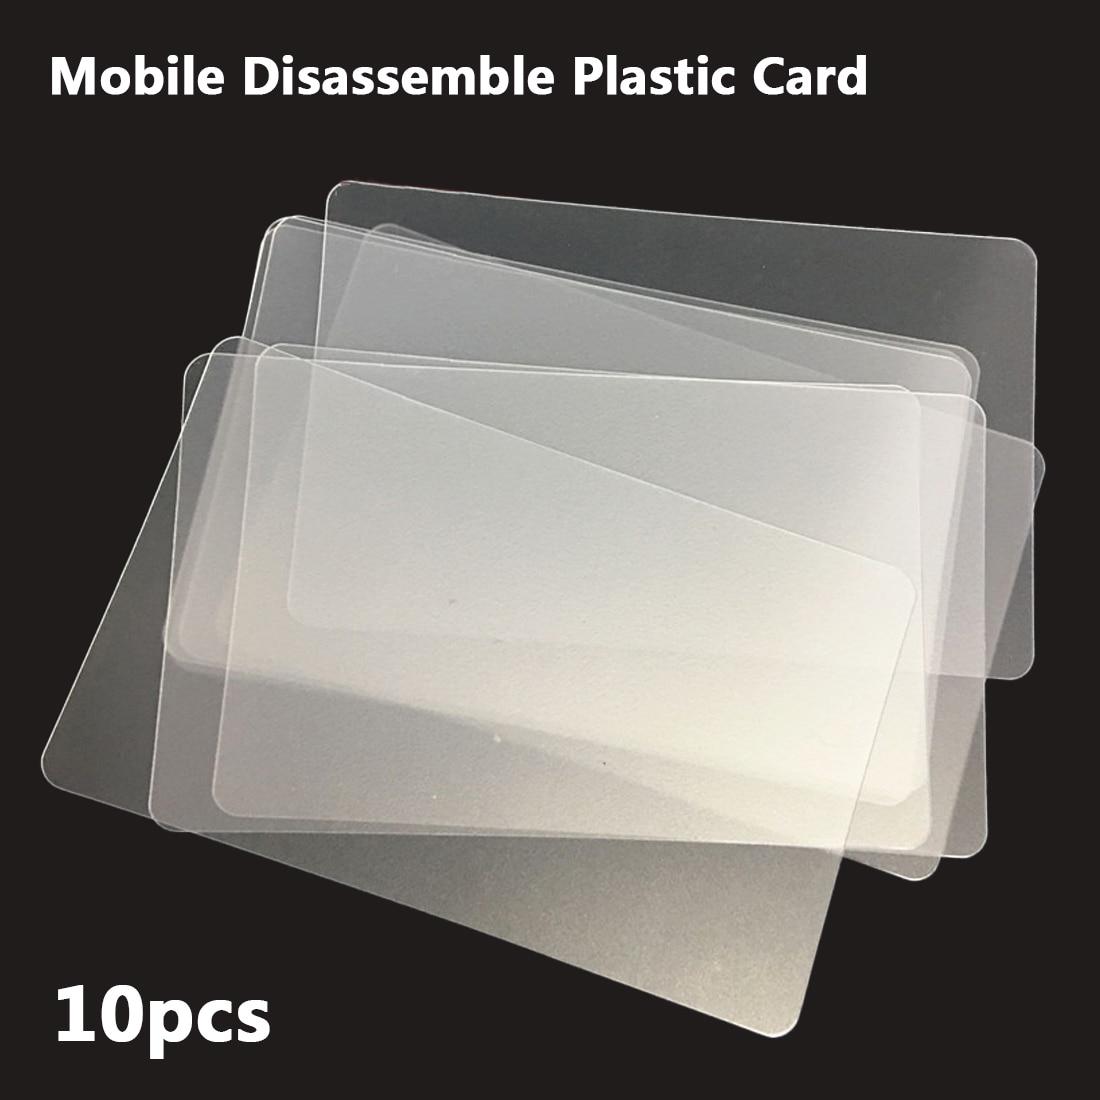 10pcs Plastic Card Pry Opening Scraper For IPhone IPad Tablet For Samsung Mobile Phone Glued Screen Repair Tool Hand Tool Set